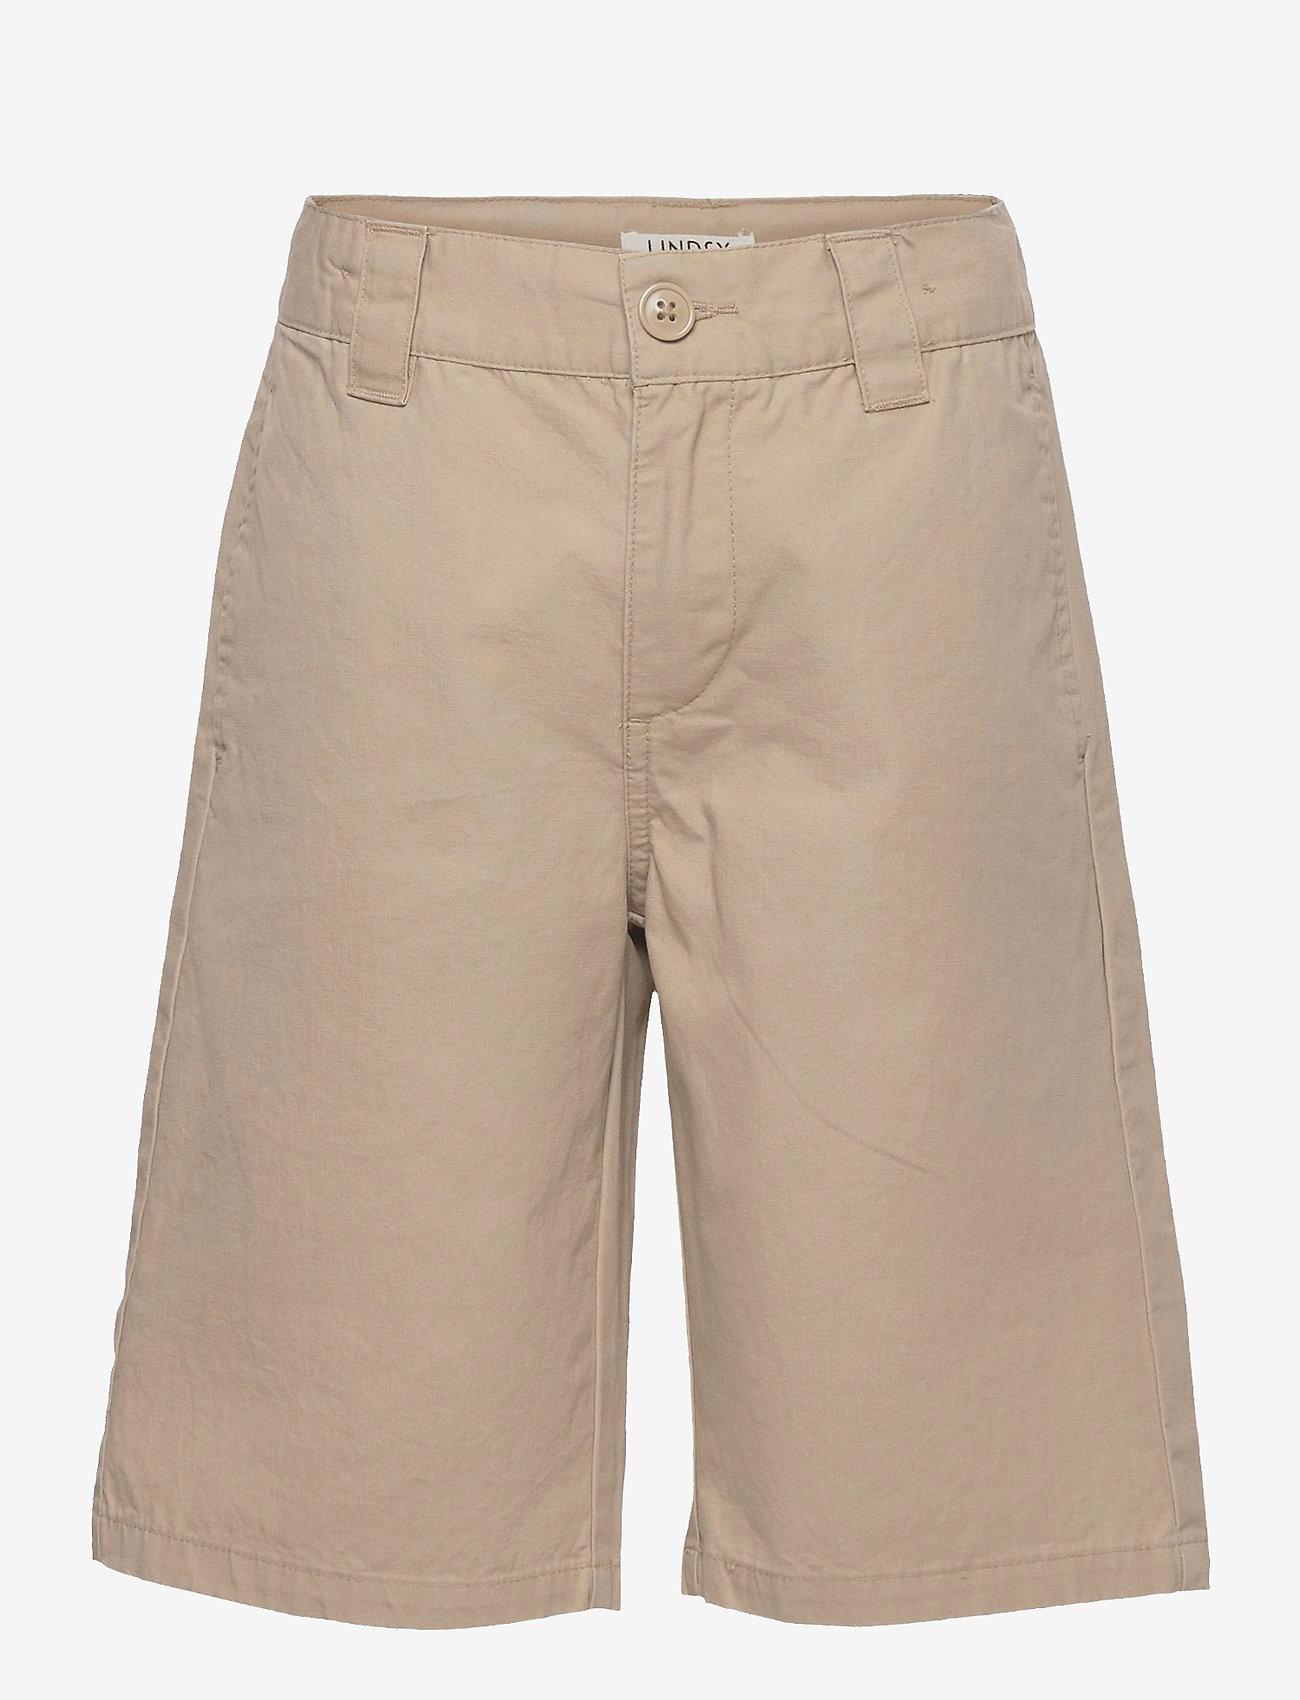 Lindex - Shorts skatefit  wide leg - shorts - beige - 0